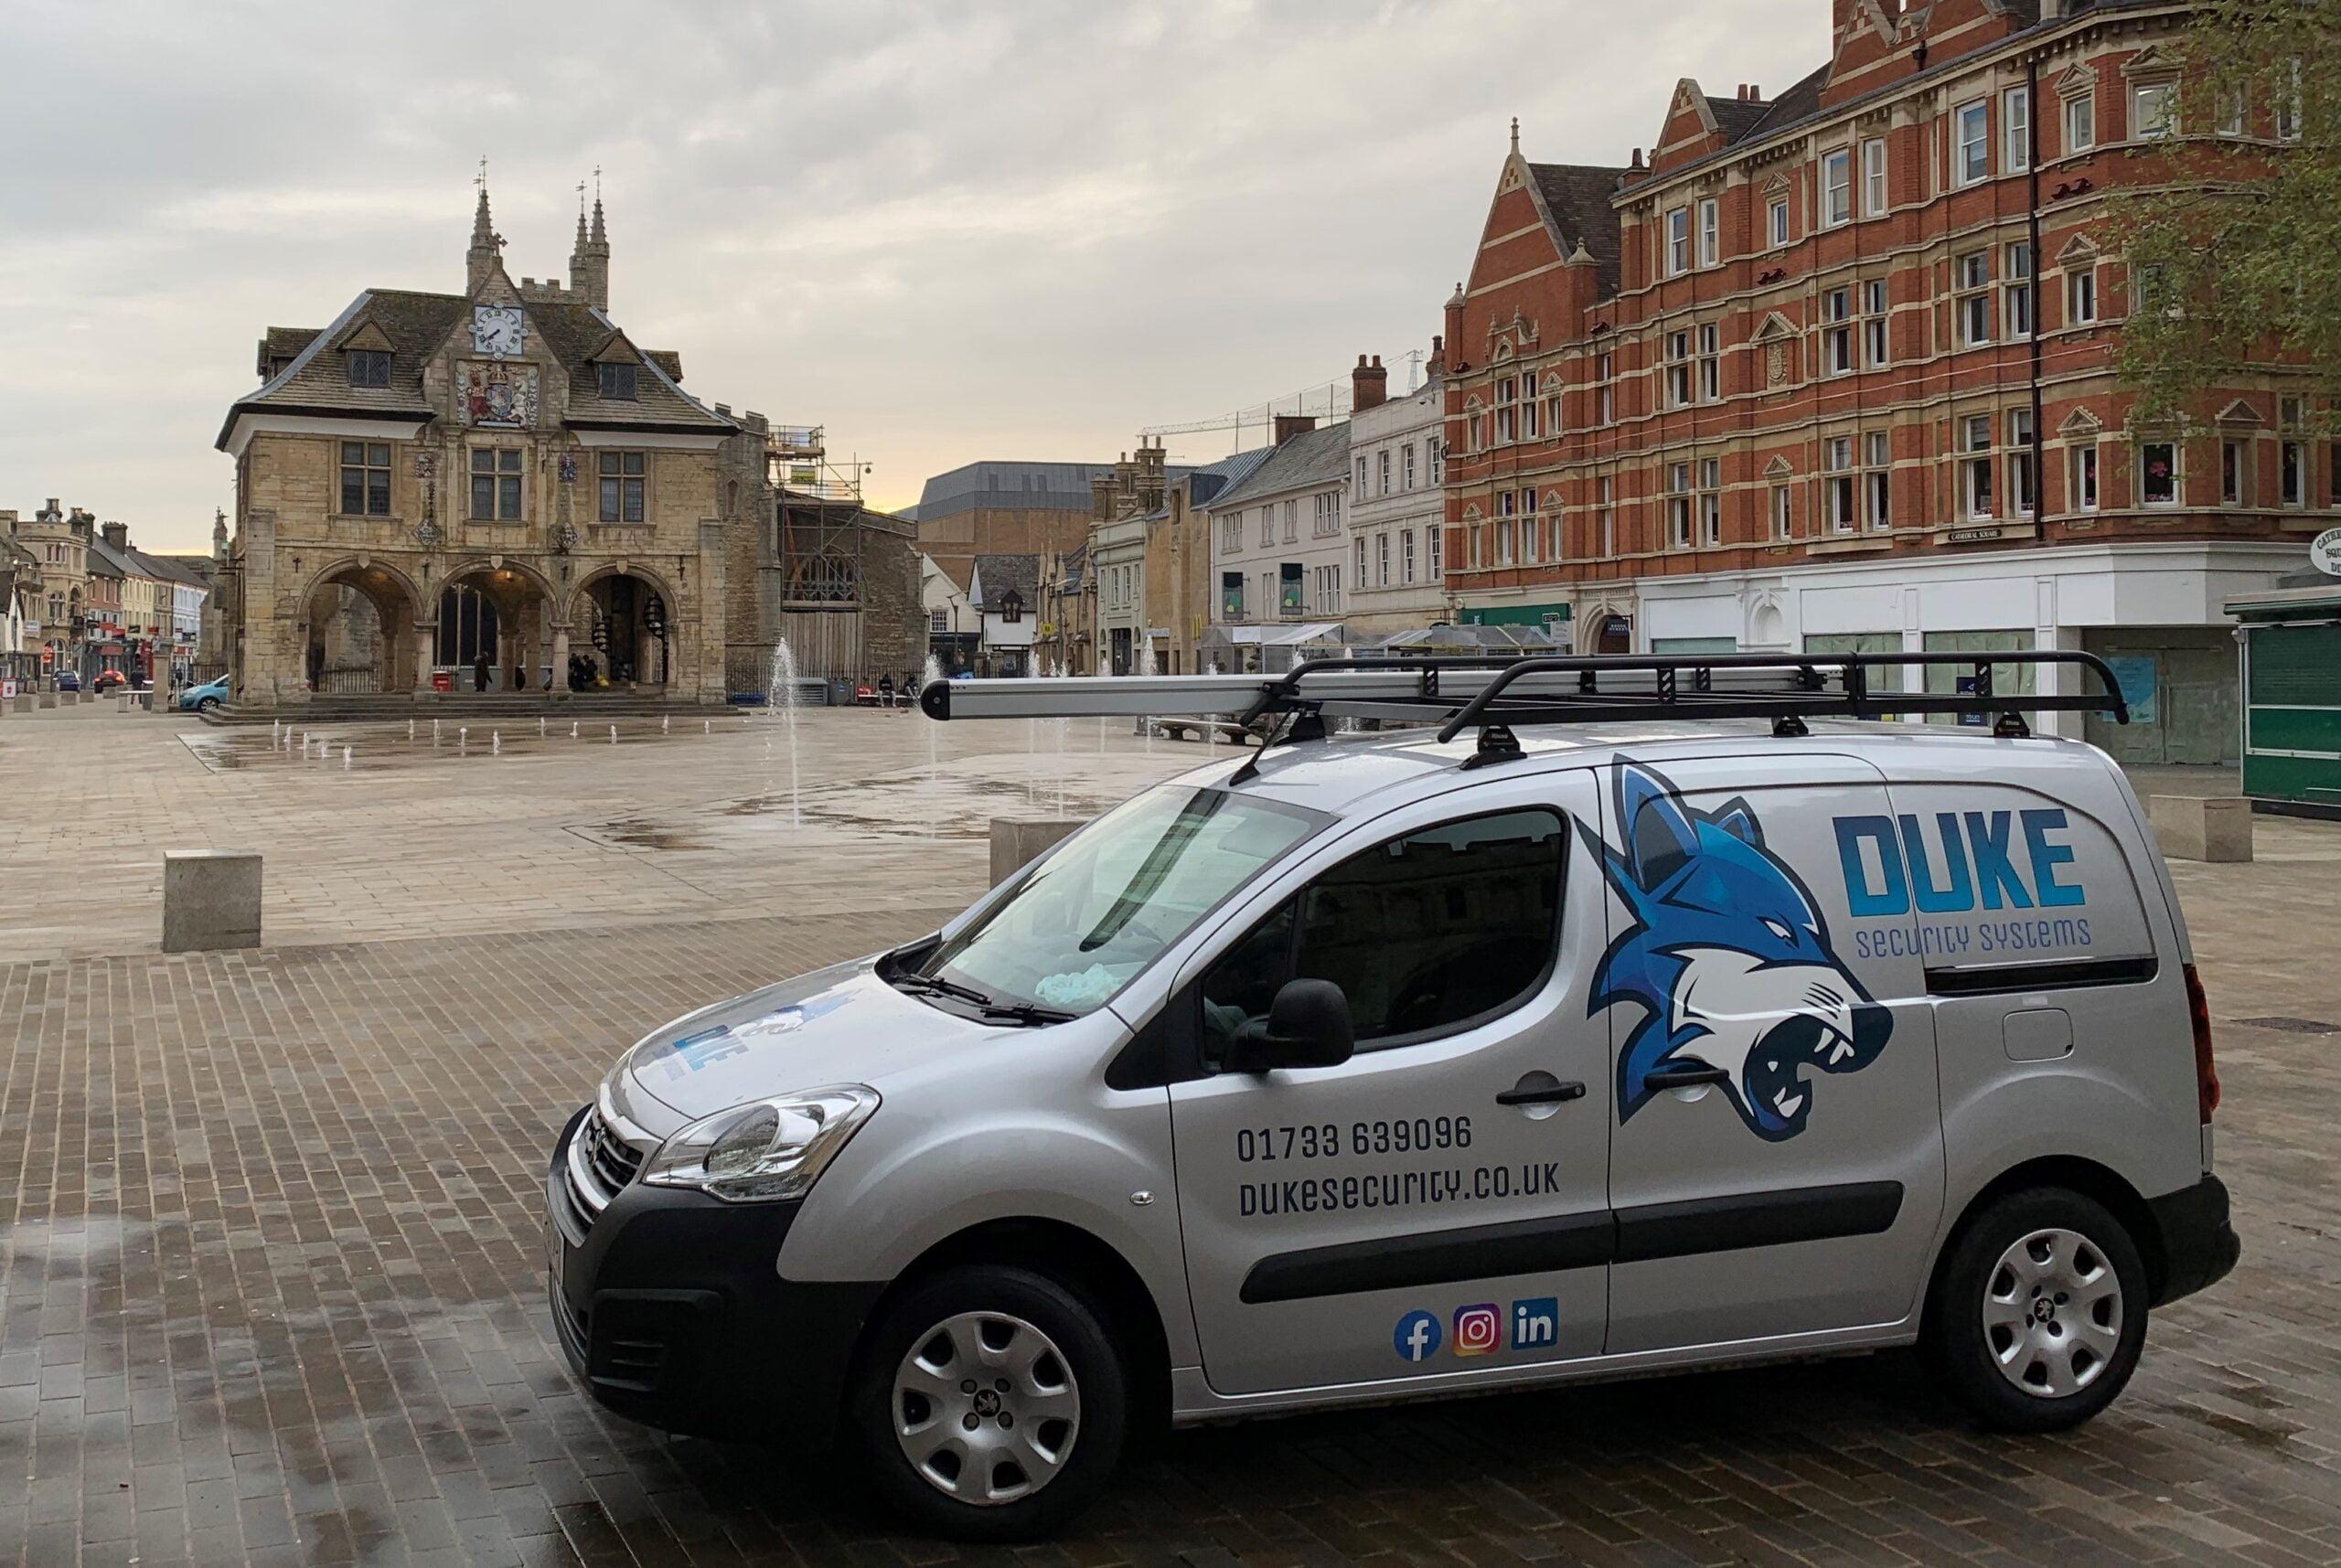 Duke Security Systems, Peterborough, CCTV Installation